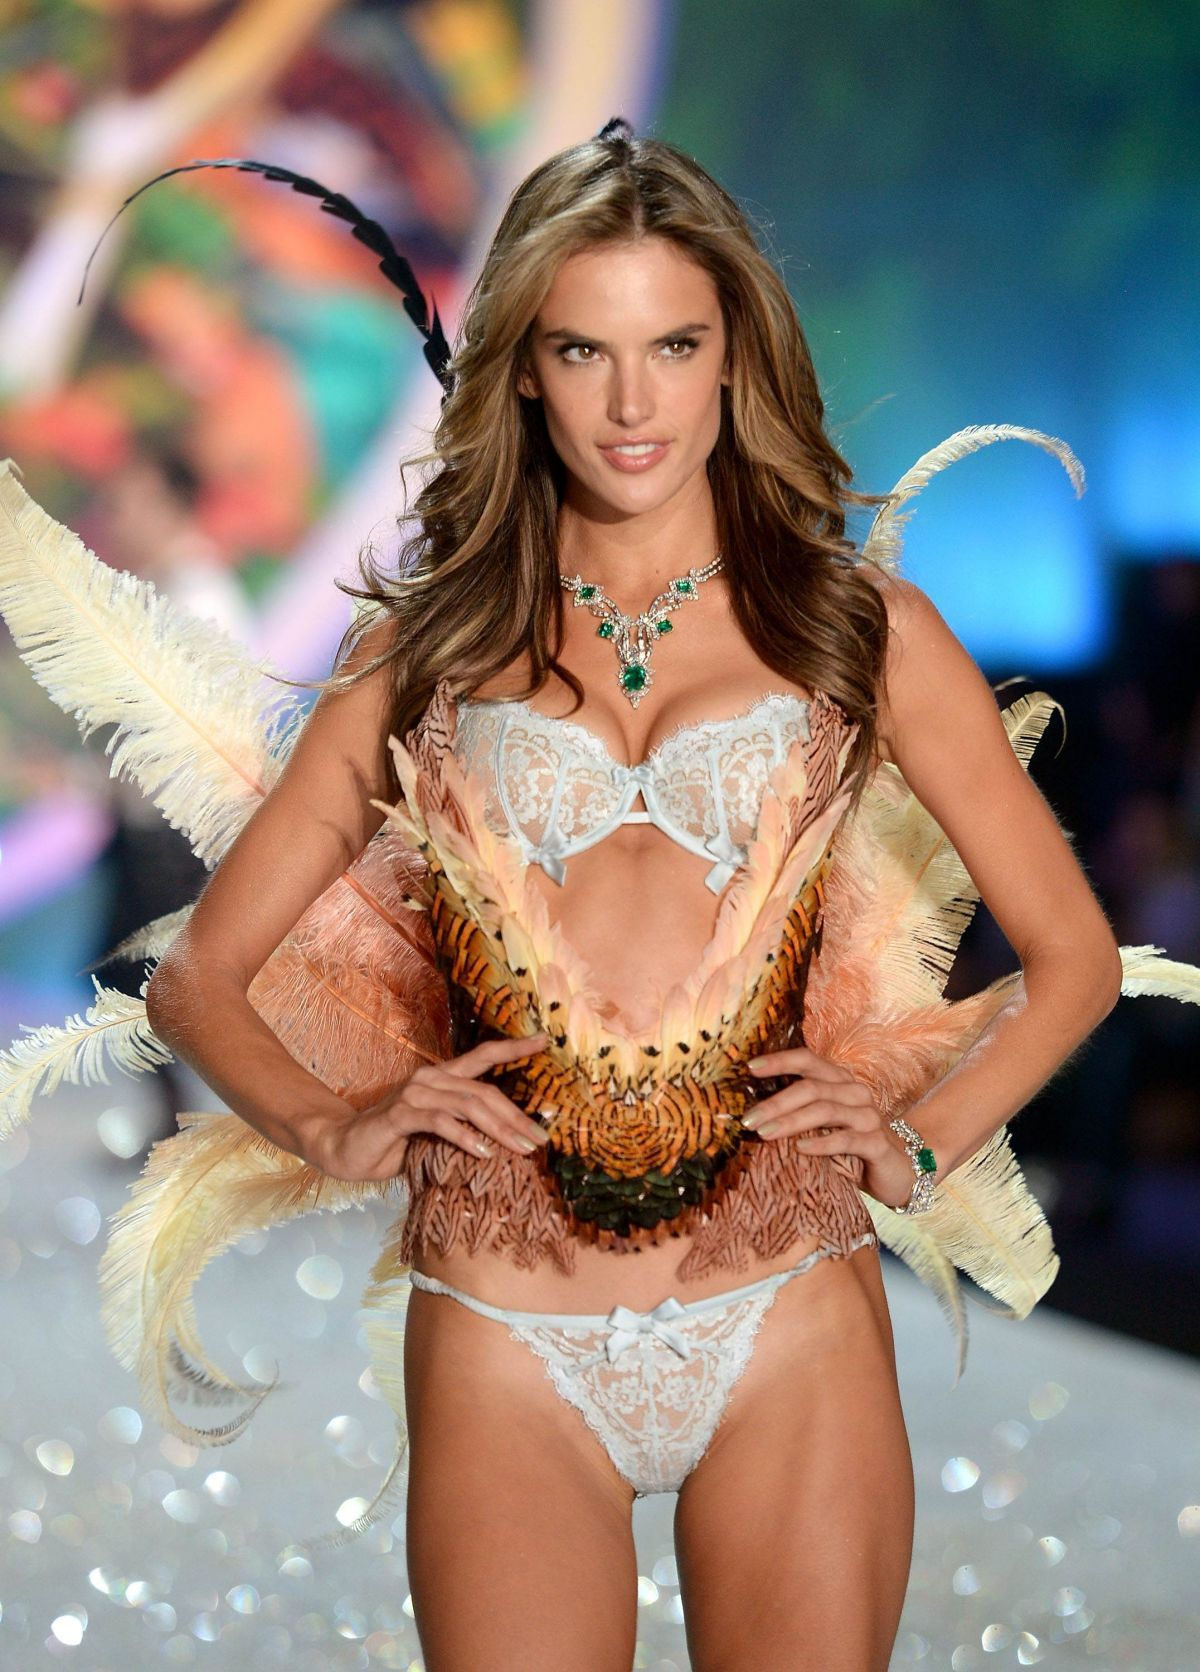 Wonderful! 5 Moves To Get A Tight, Toned Body Like Victoria's Secret Model Alessandra Ambrosio